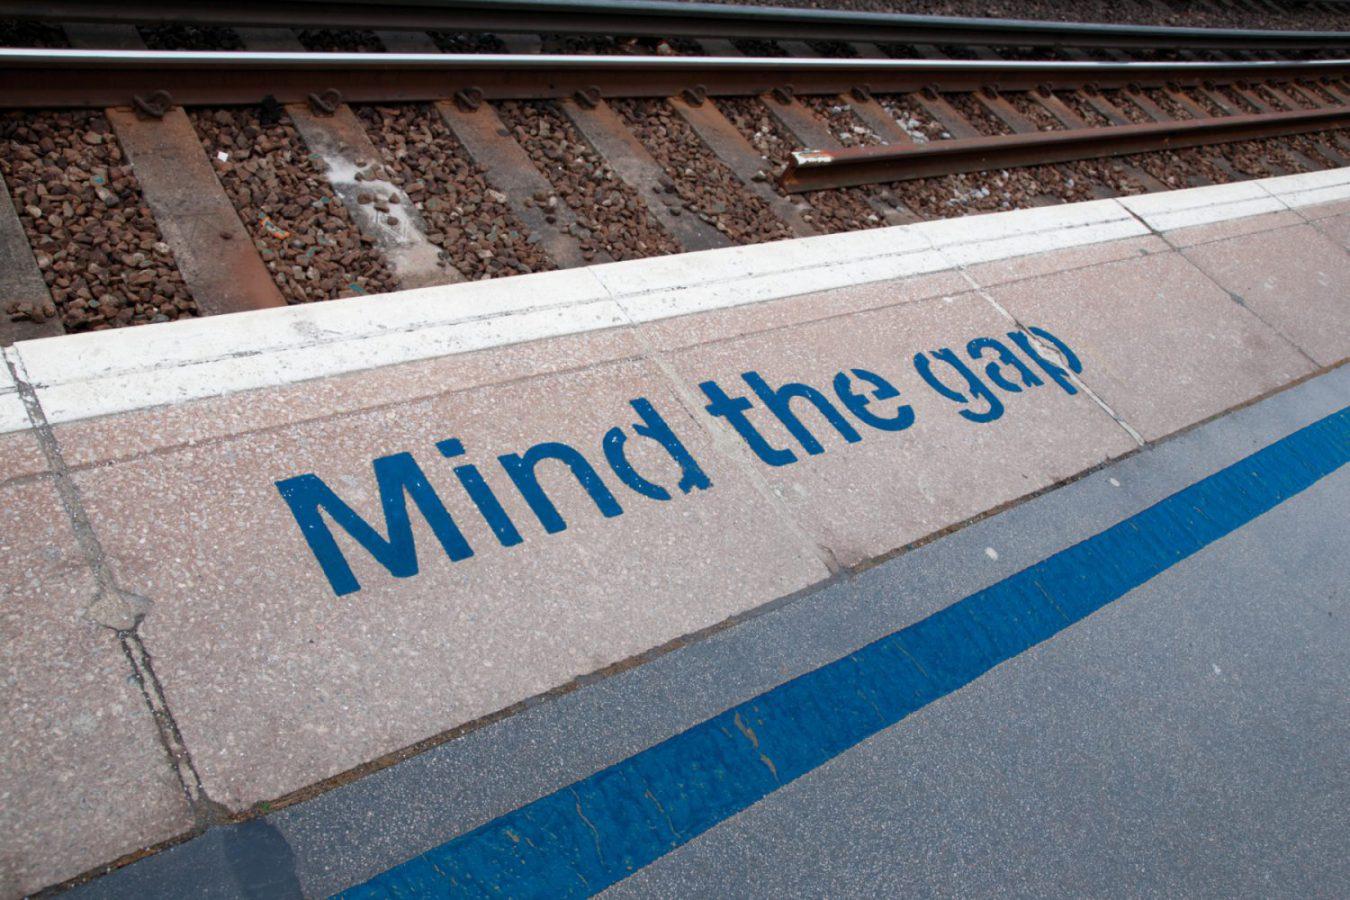 Mind the gap - Protection Gap - Protezione Imc